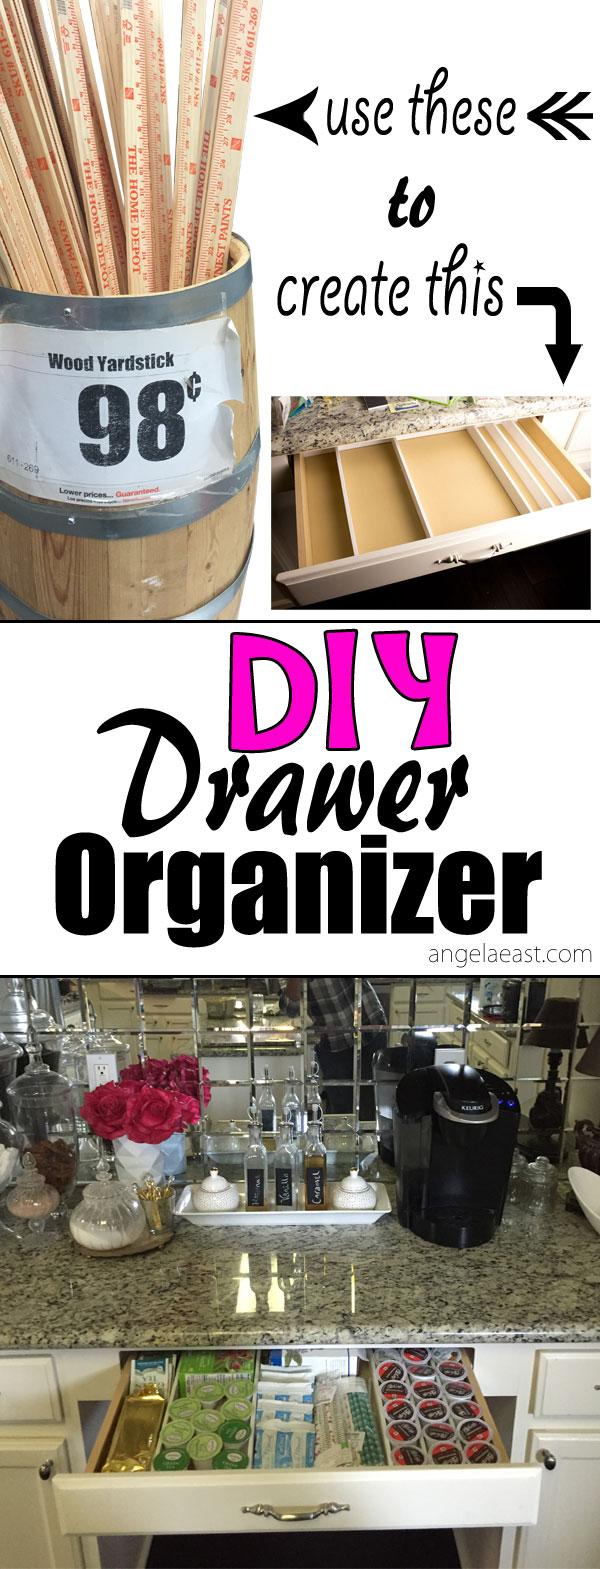 DIY How to create drawer separator with yard sticks on angelaeast.com | homeddecor | coffee bar | coffee station